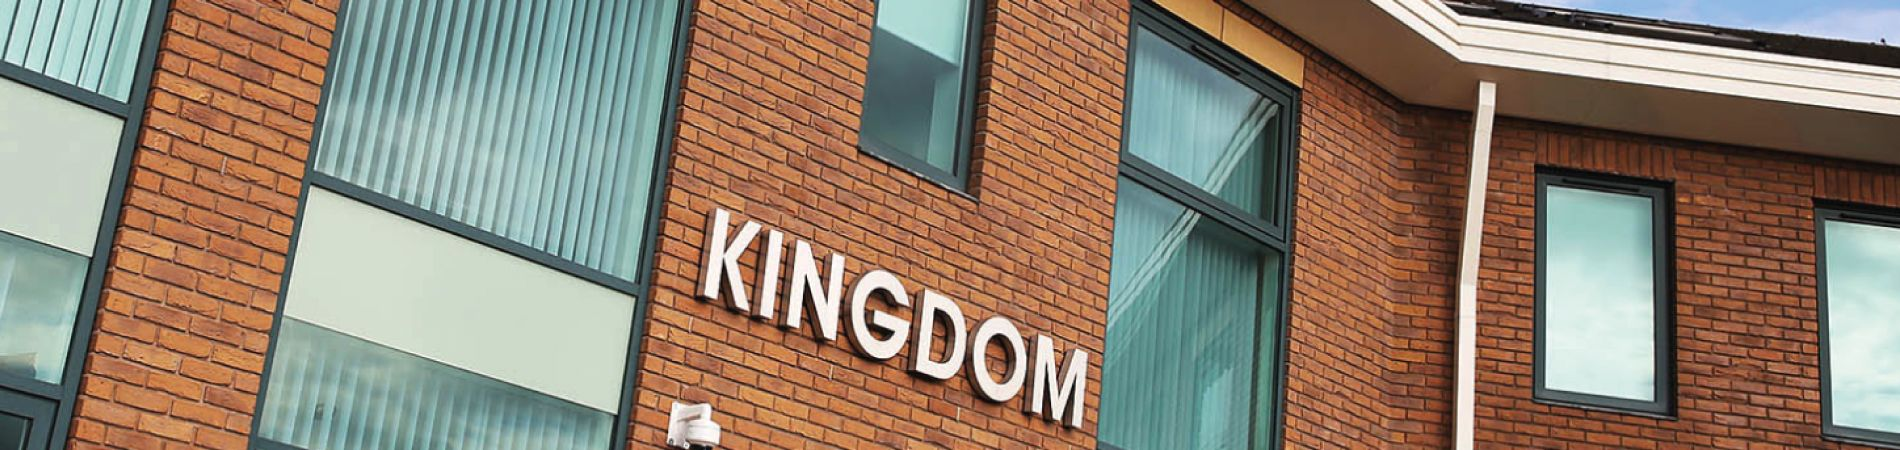 Kingdom-building